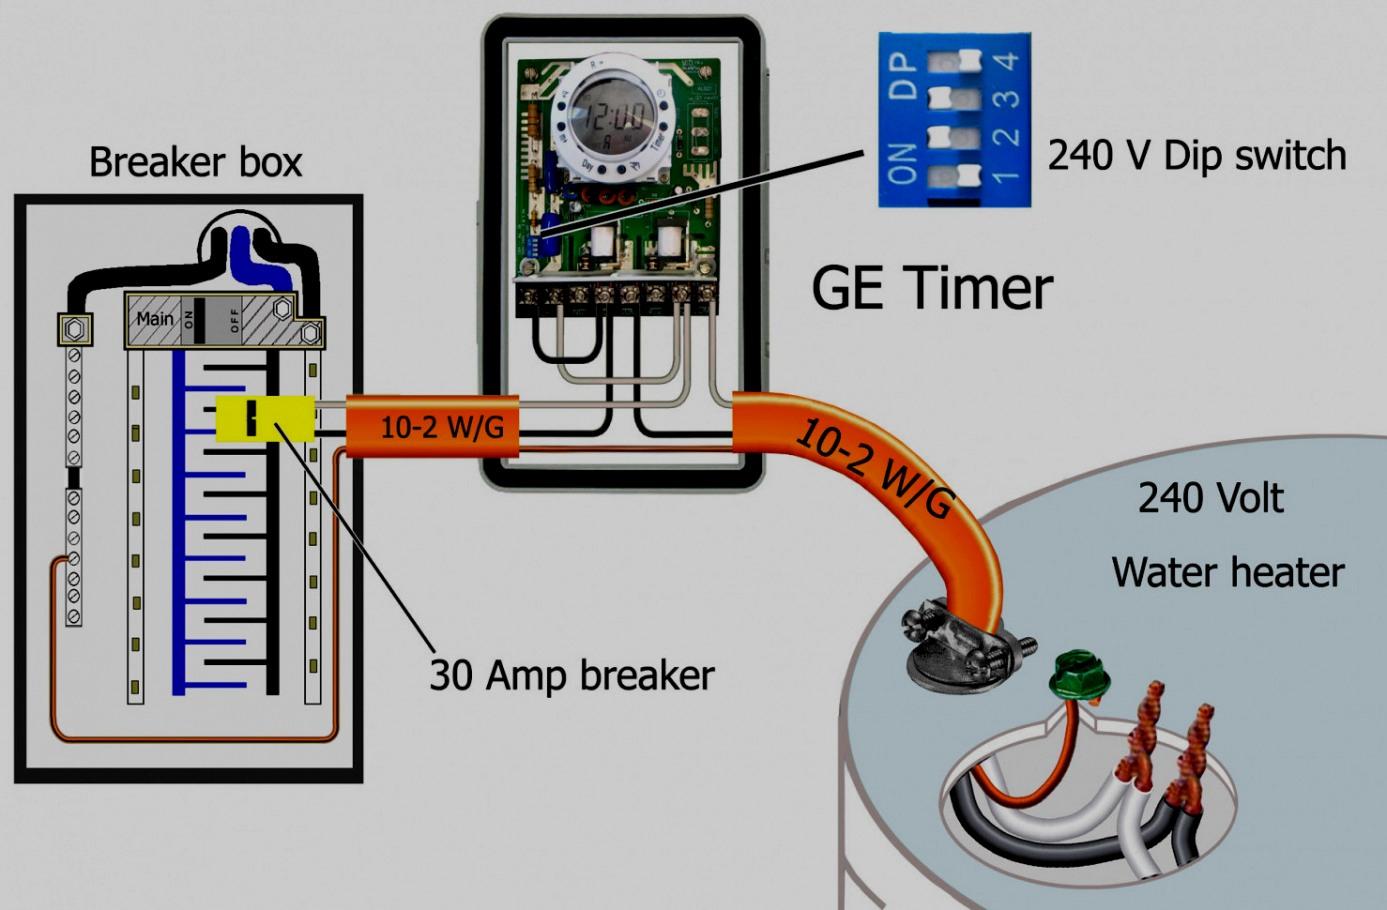 240 Volt Heater Wiring Diagram | Manual E-Books - 240 Volt Heater Wiring Diagram